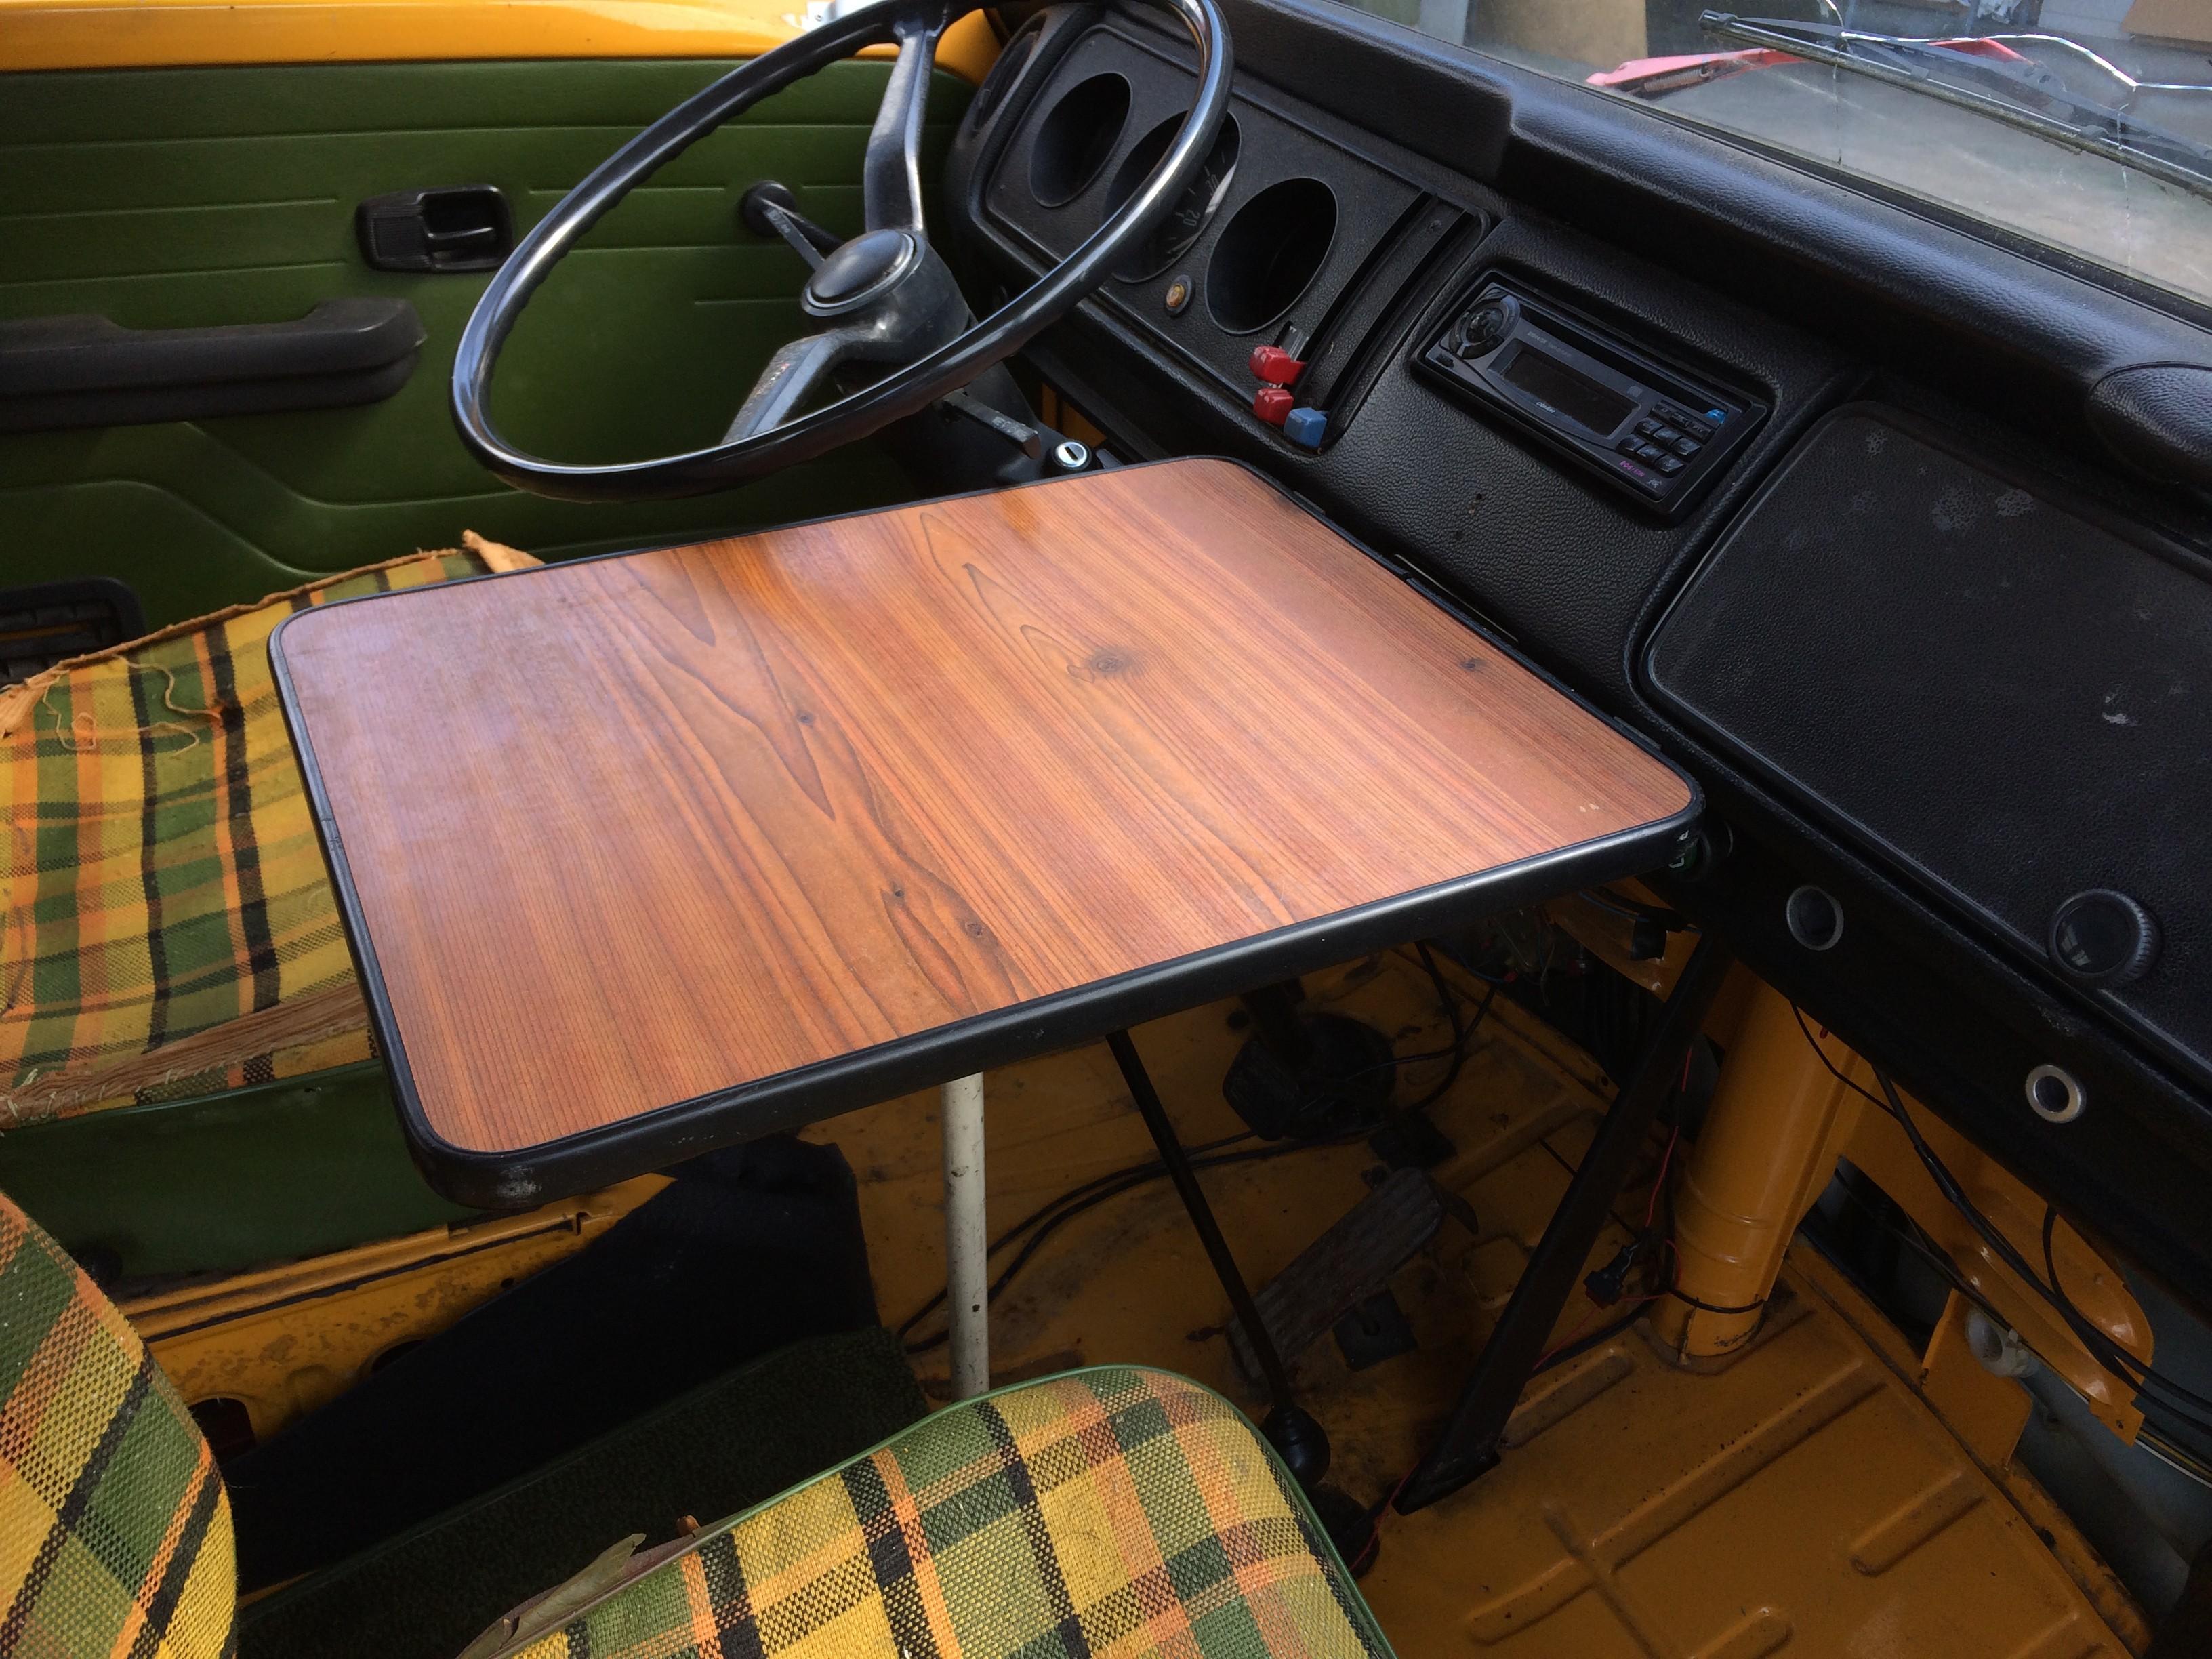 Storage Box Green C9609g T2 Westfalia Wooden Buddy Seat Campervan Motorhome Parts Vehicle Parts Accessories